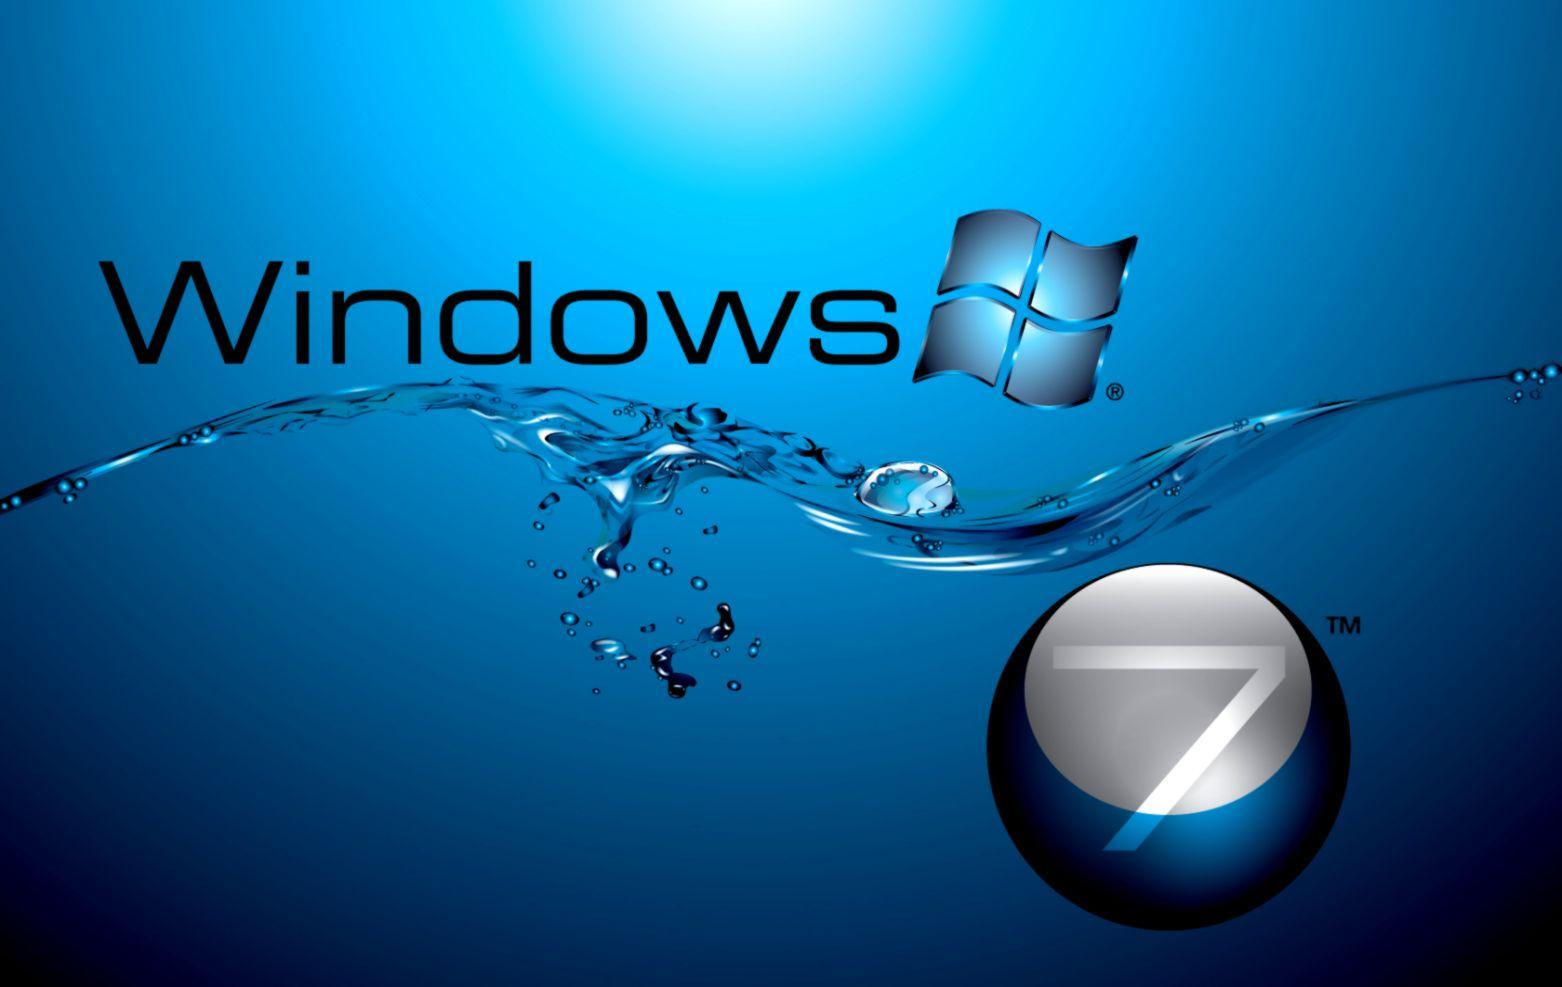 Windows 7 Wallpapers Download Hd Windows 7 Wallpaper Zoom Wallpapers